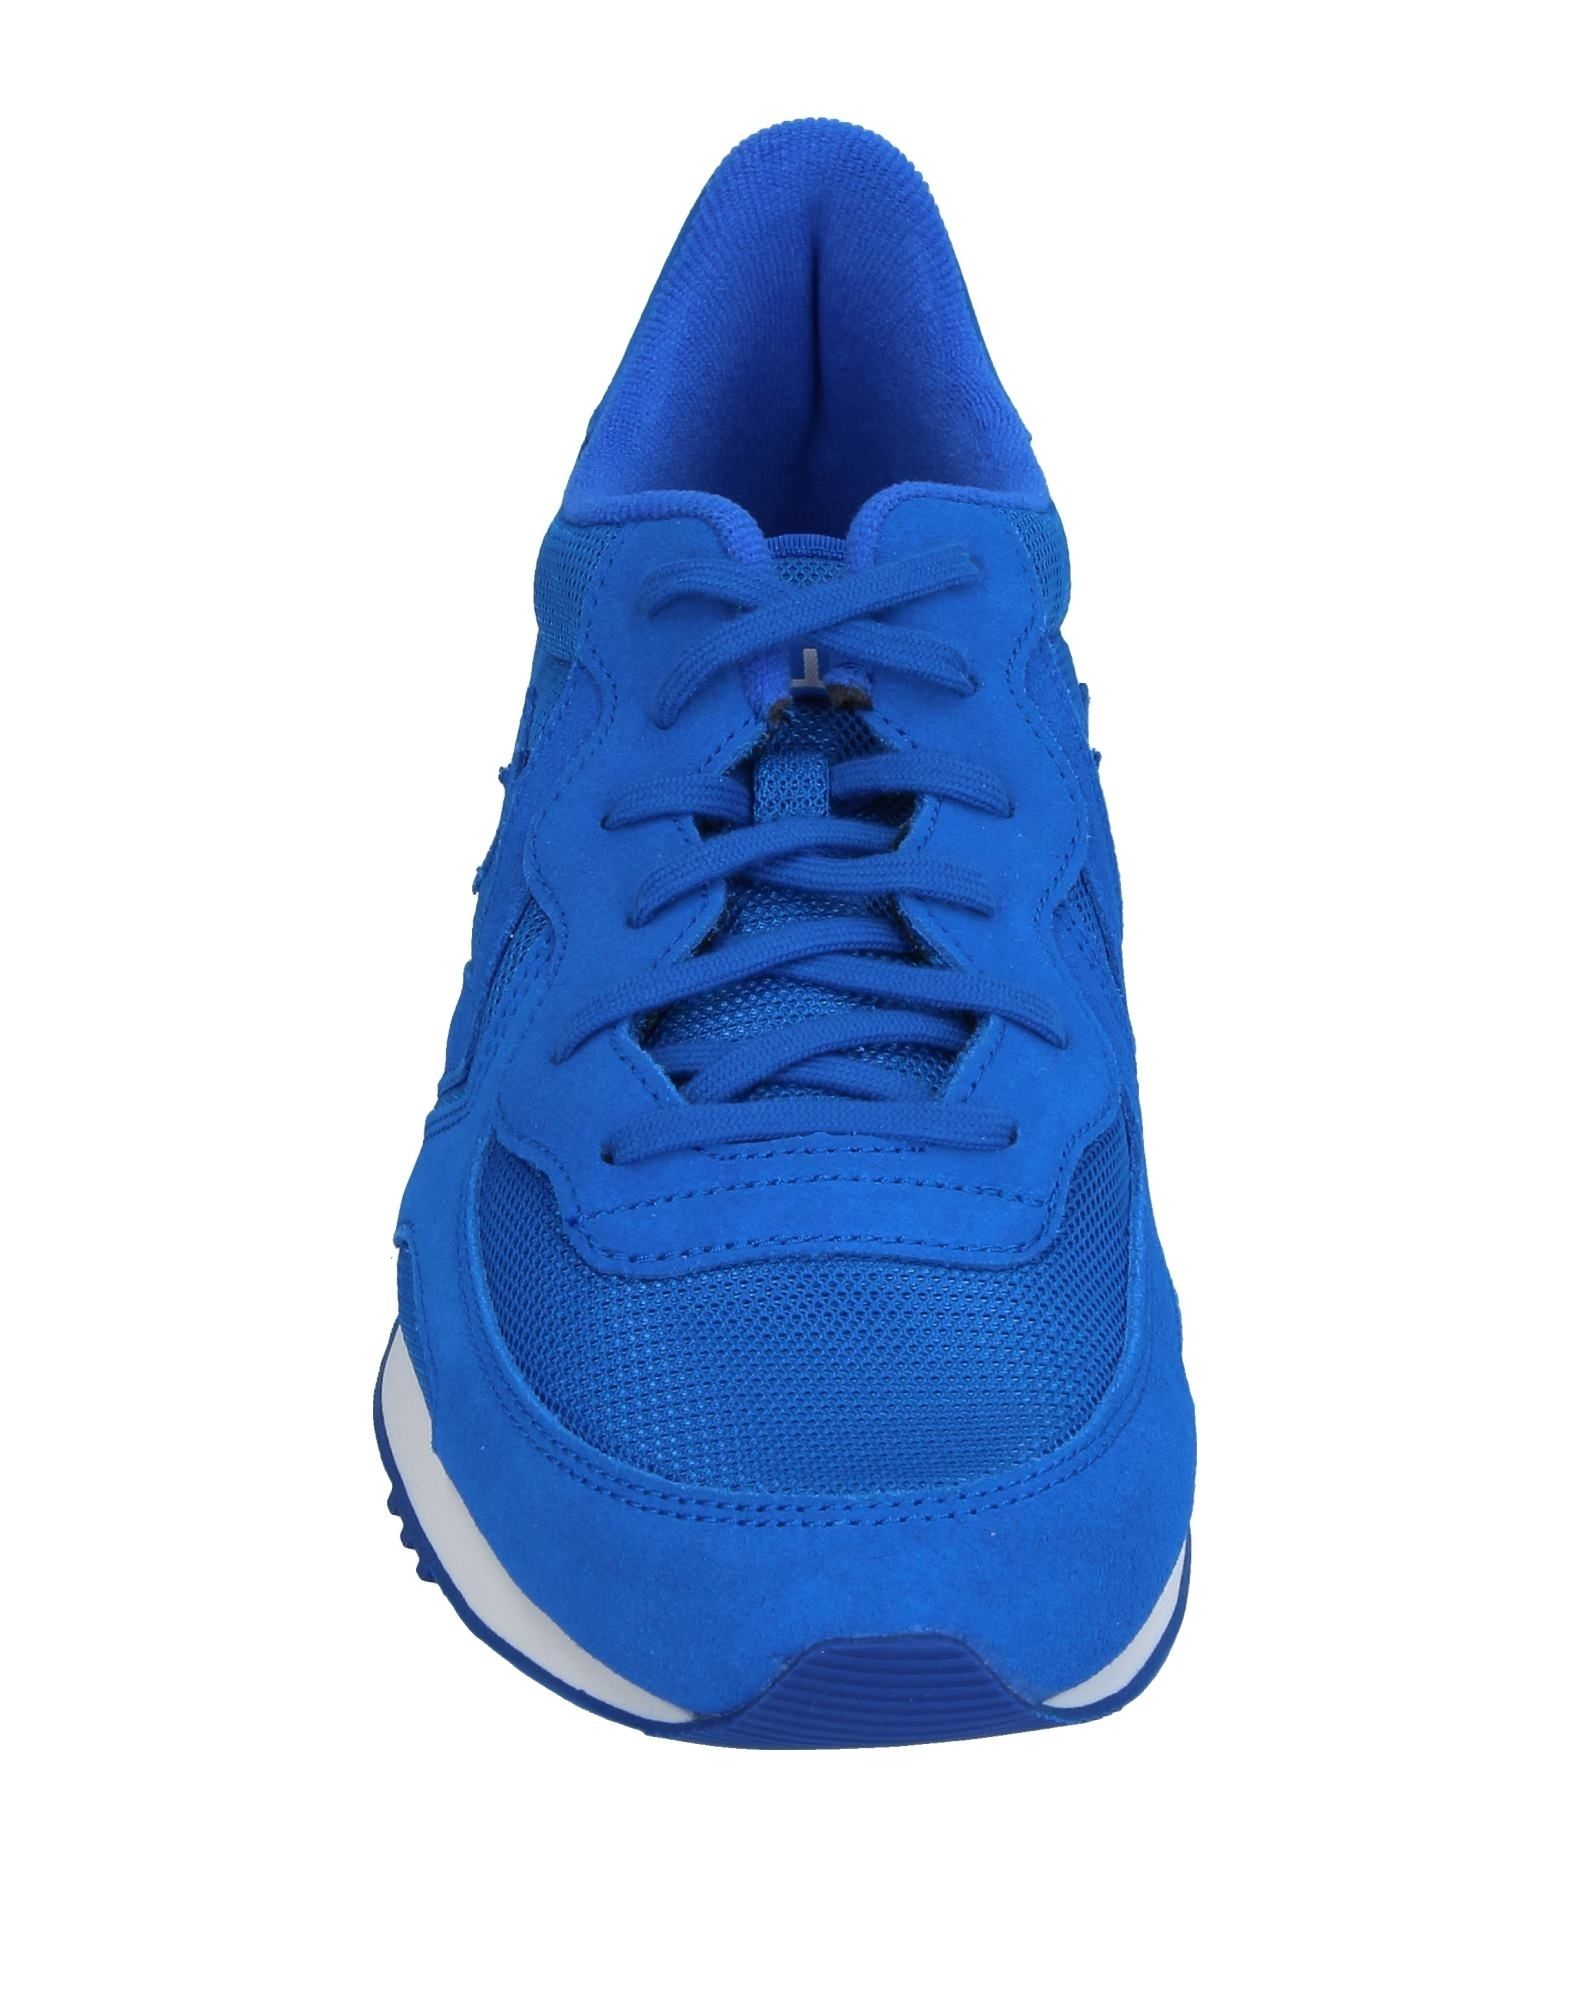 Moda Sneakers Converse Uomo - 11277312US